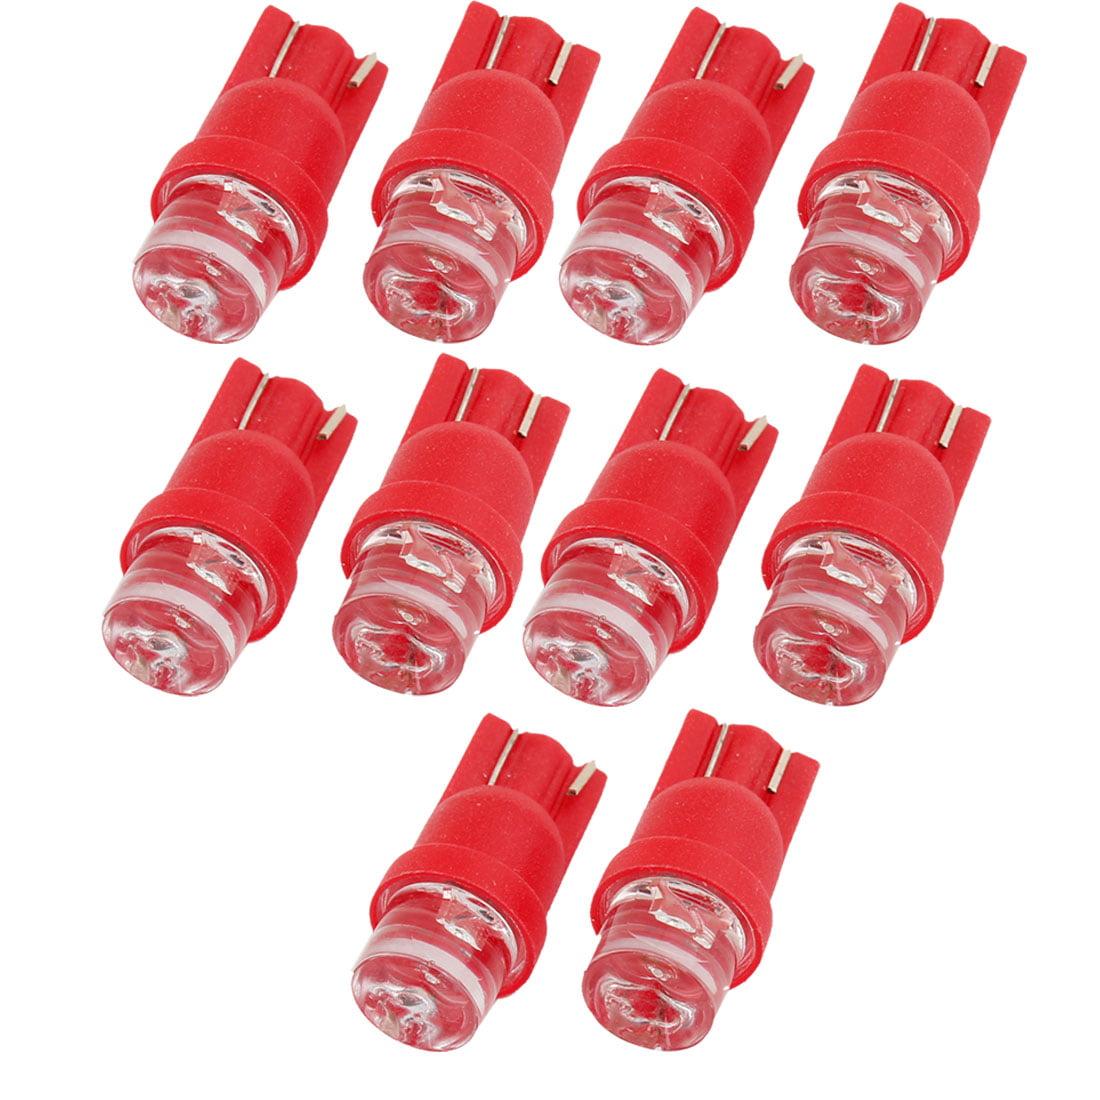 10PCS Red LED T10 W5W 555 558 585 Car Bulbs Side Light Dashboard Lamp DC 12V